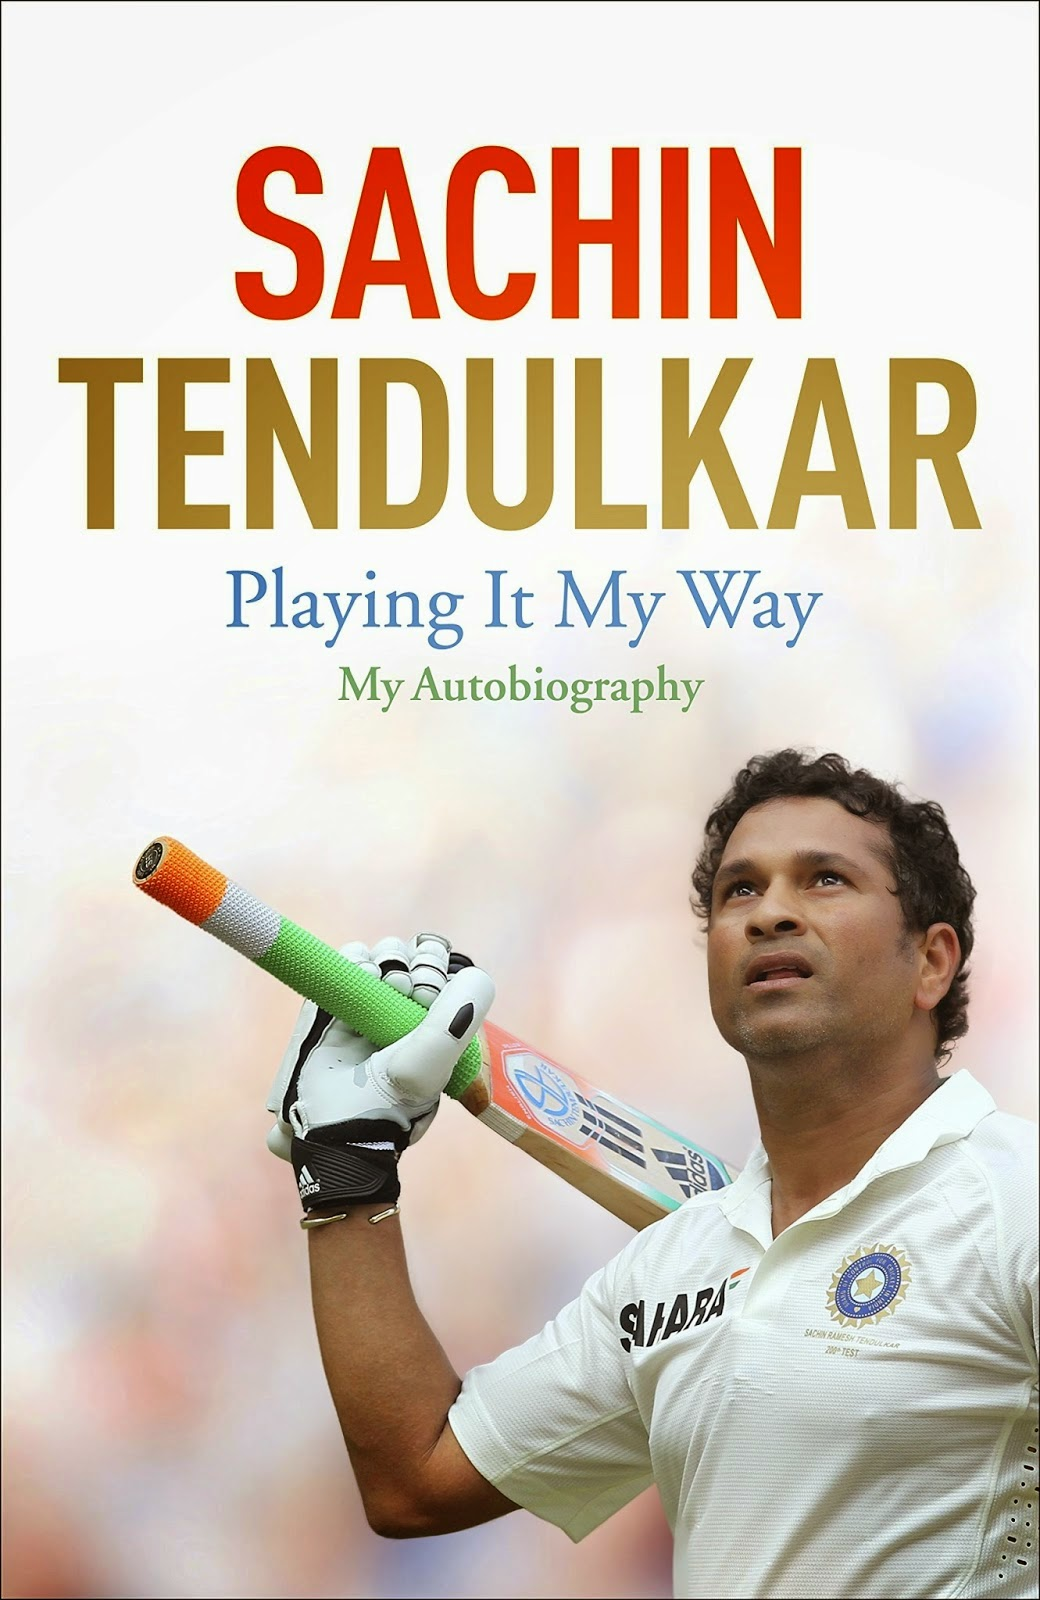 Sachin tendulkar autobiography pdf